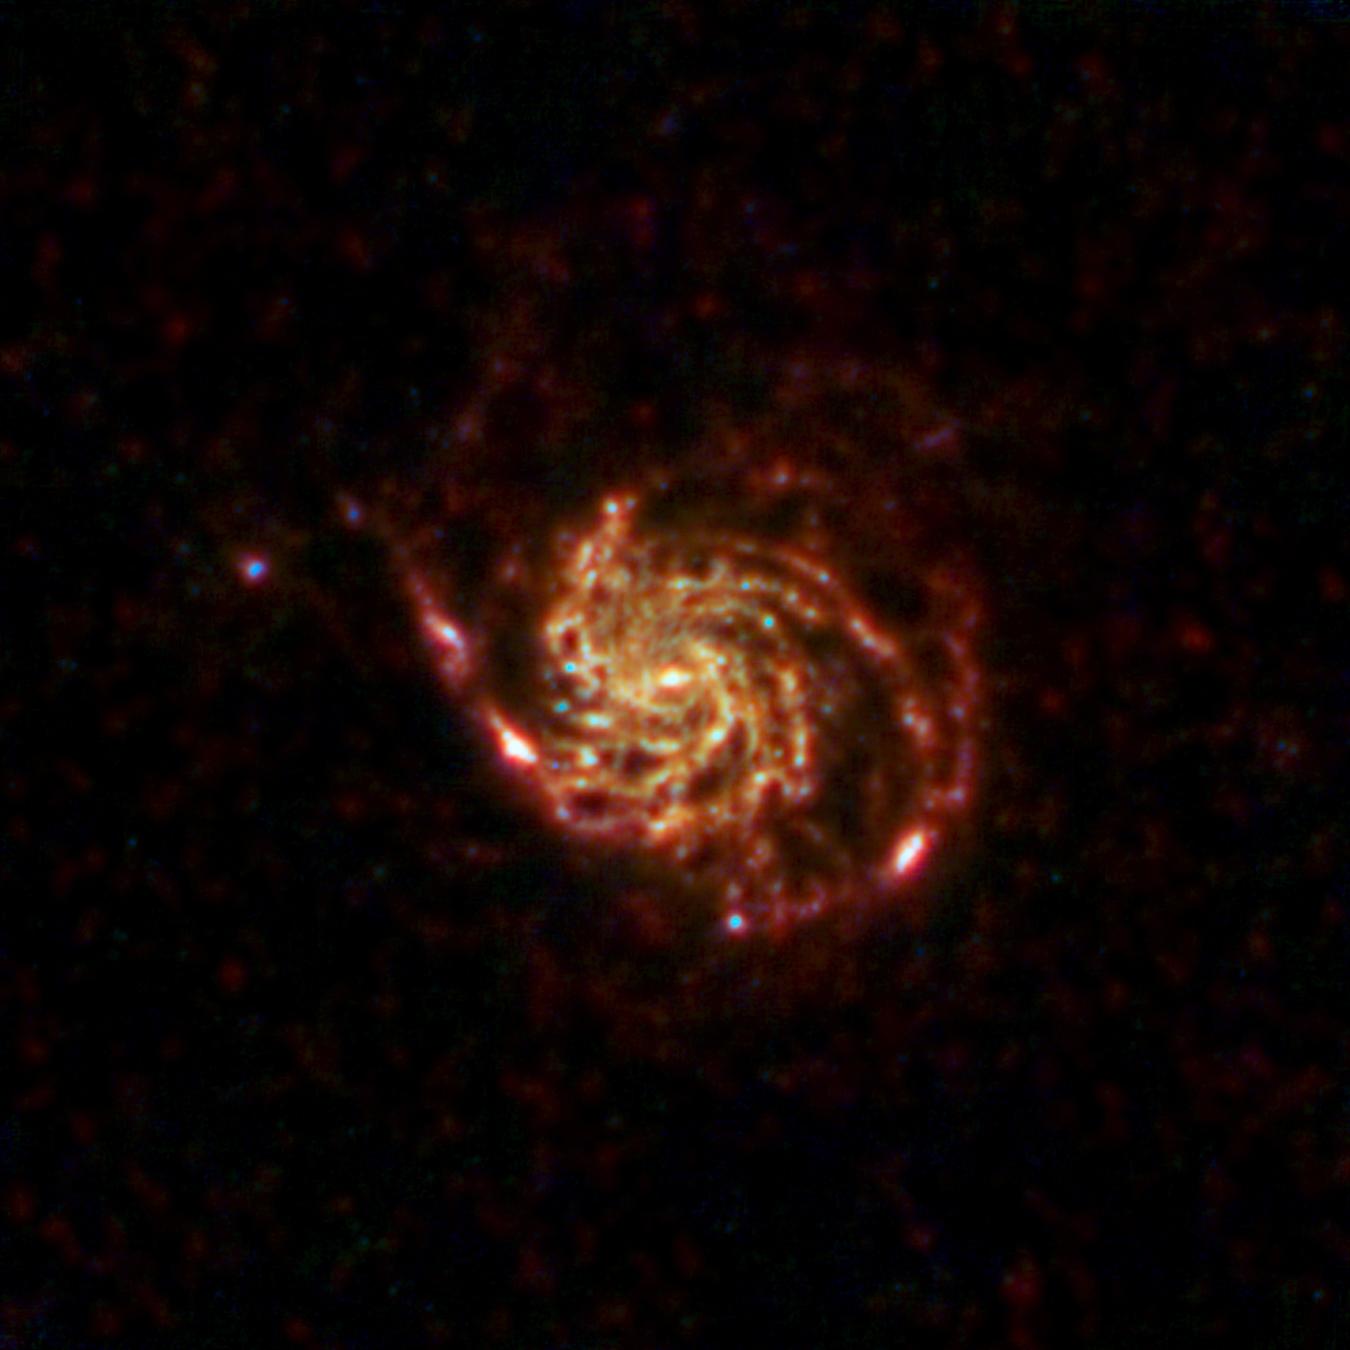 1567214822932-Herschel_M101_PACS-SPIRE.jpg